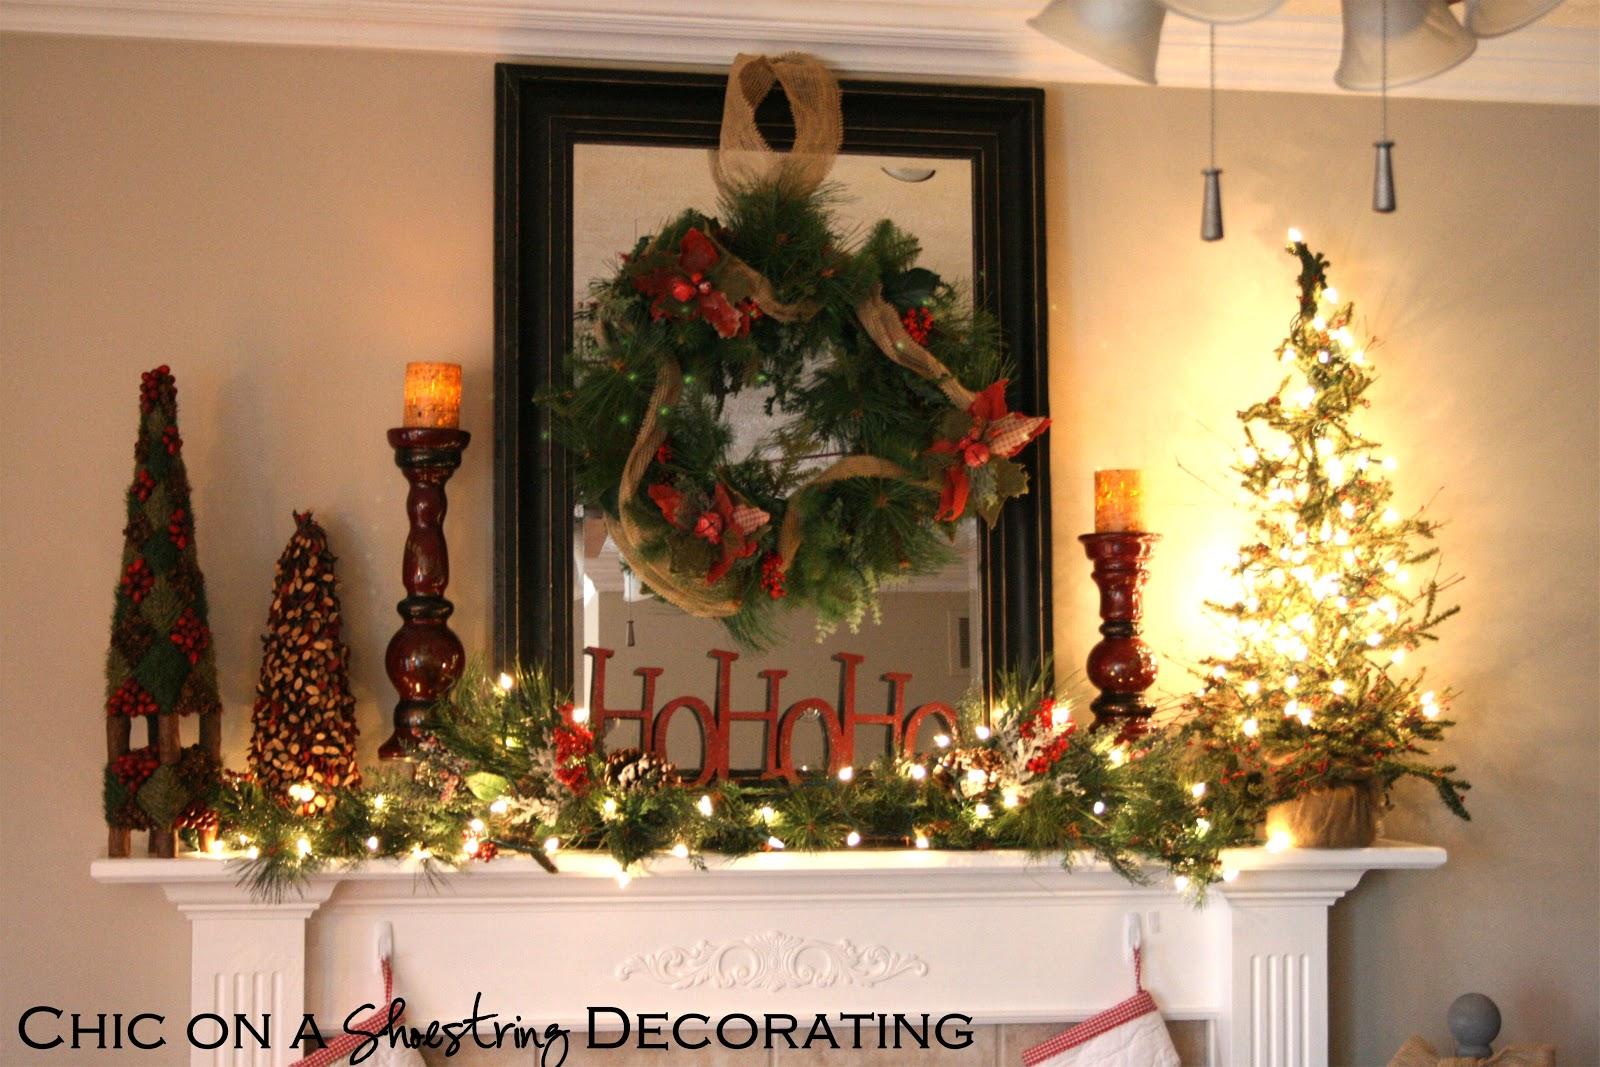 Rustic Christmas Mantel Decorating Ideas - Elitflat